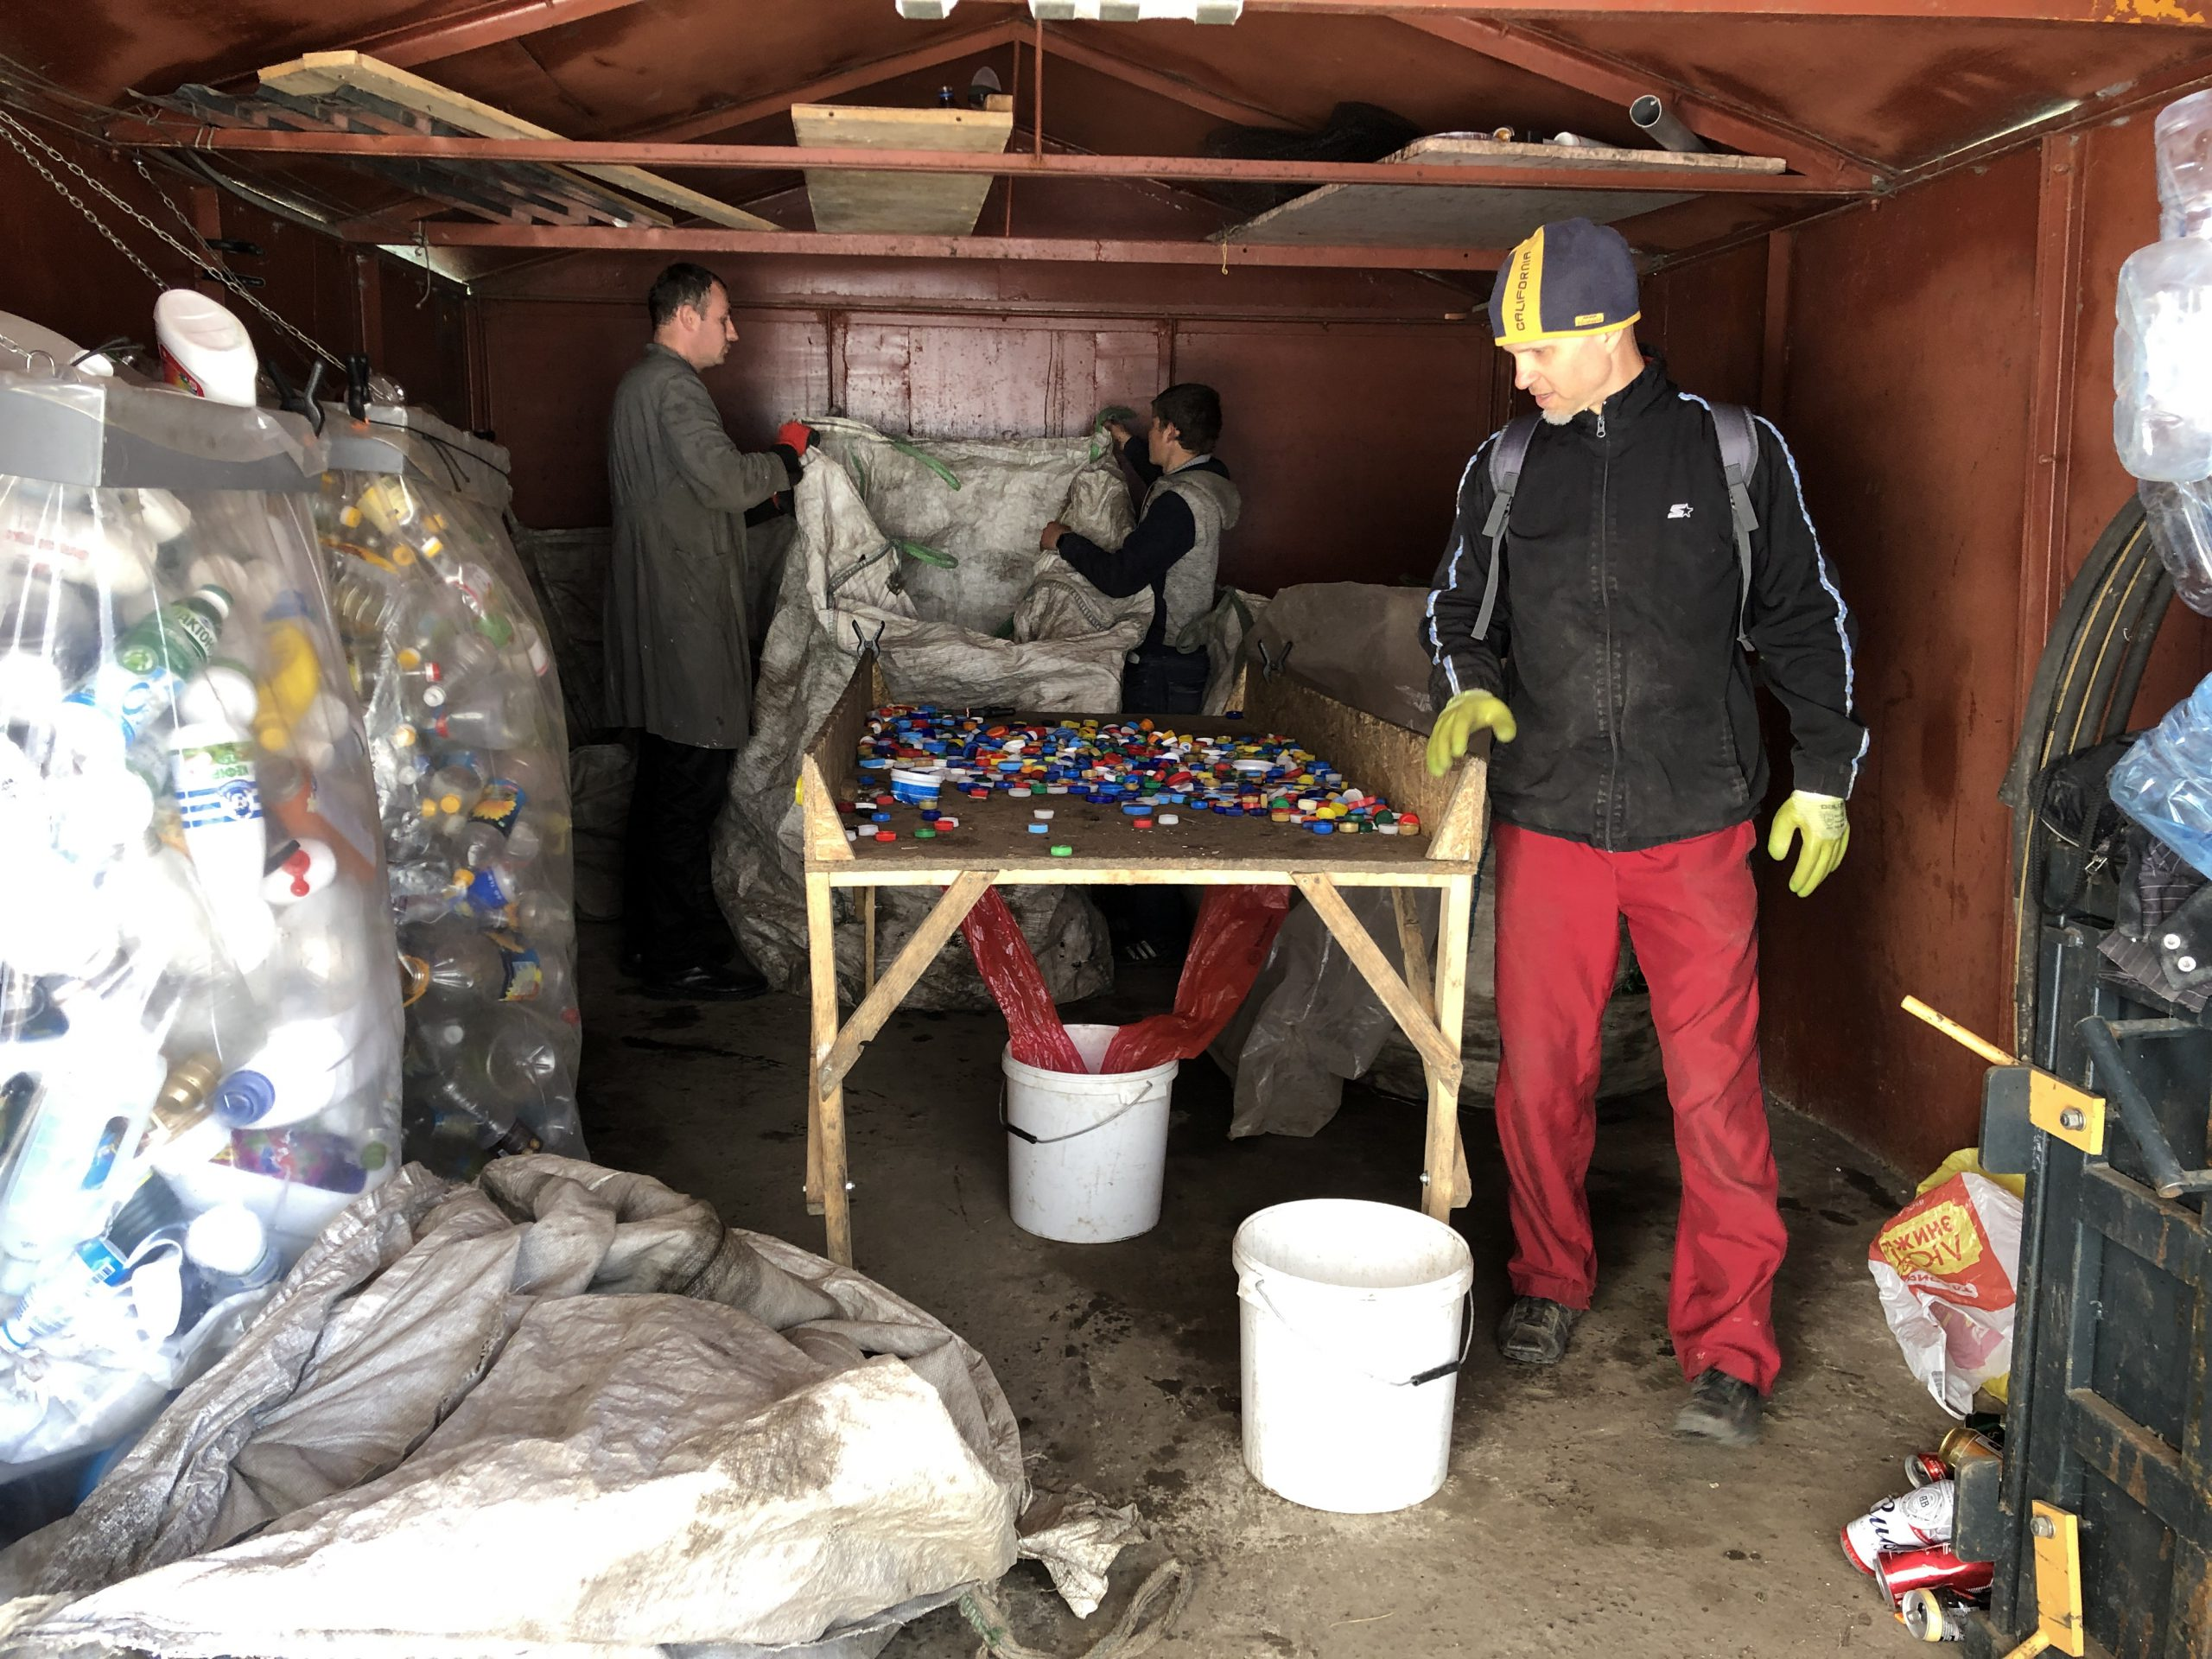 Men sort bottle caps as part of recycling project